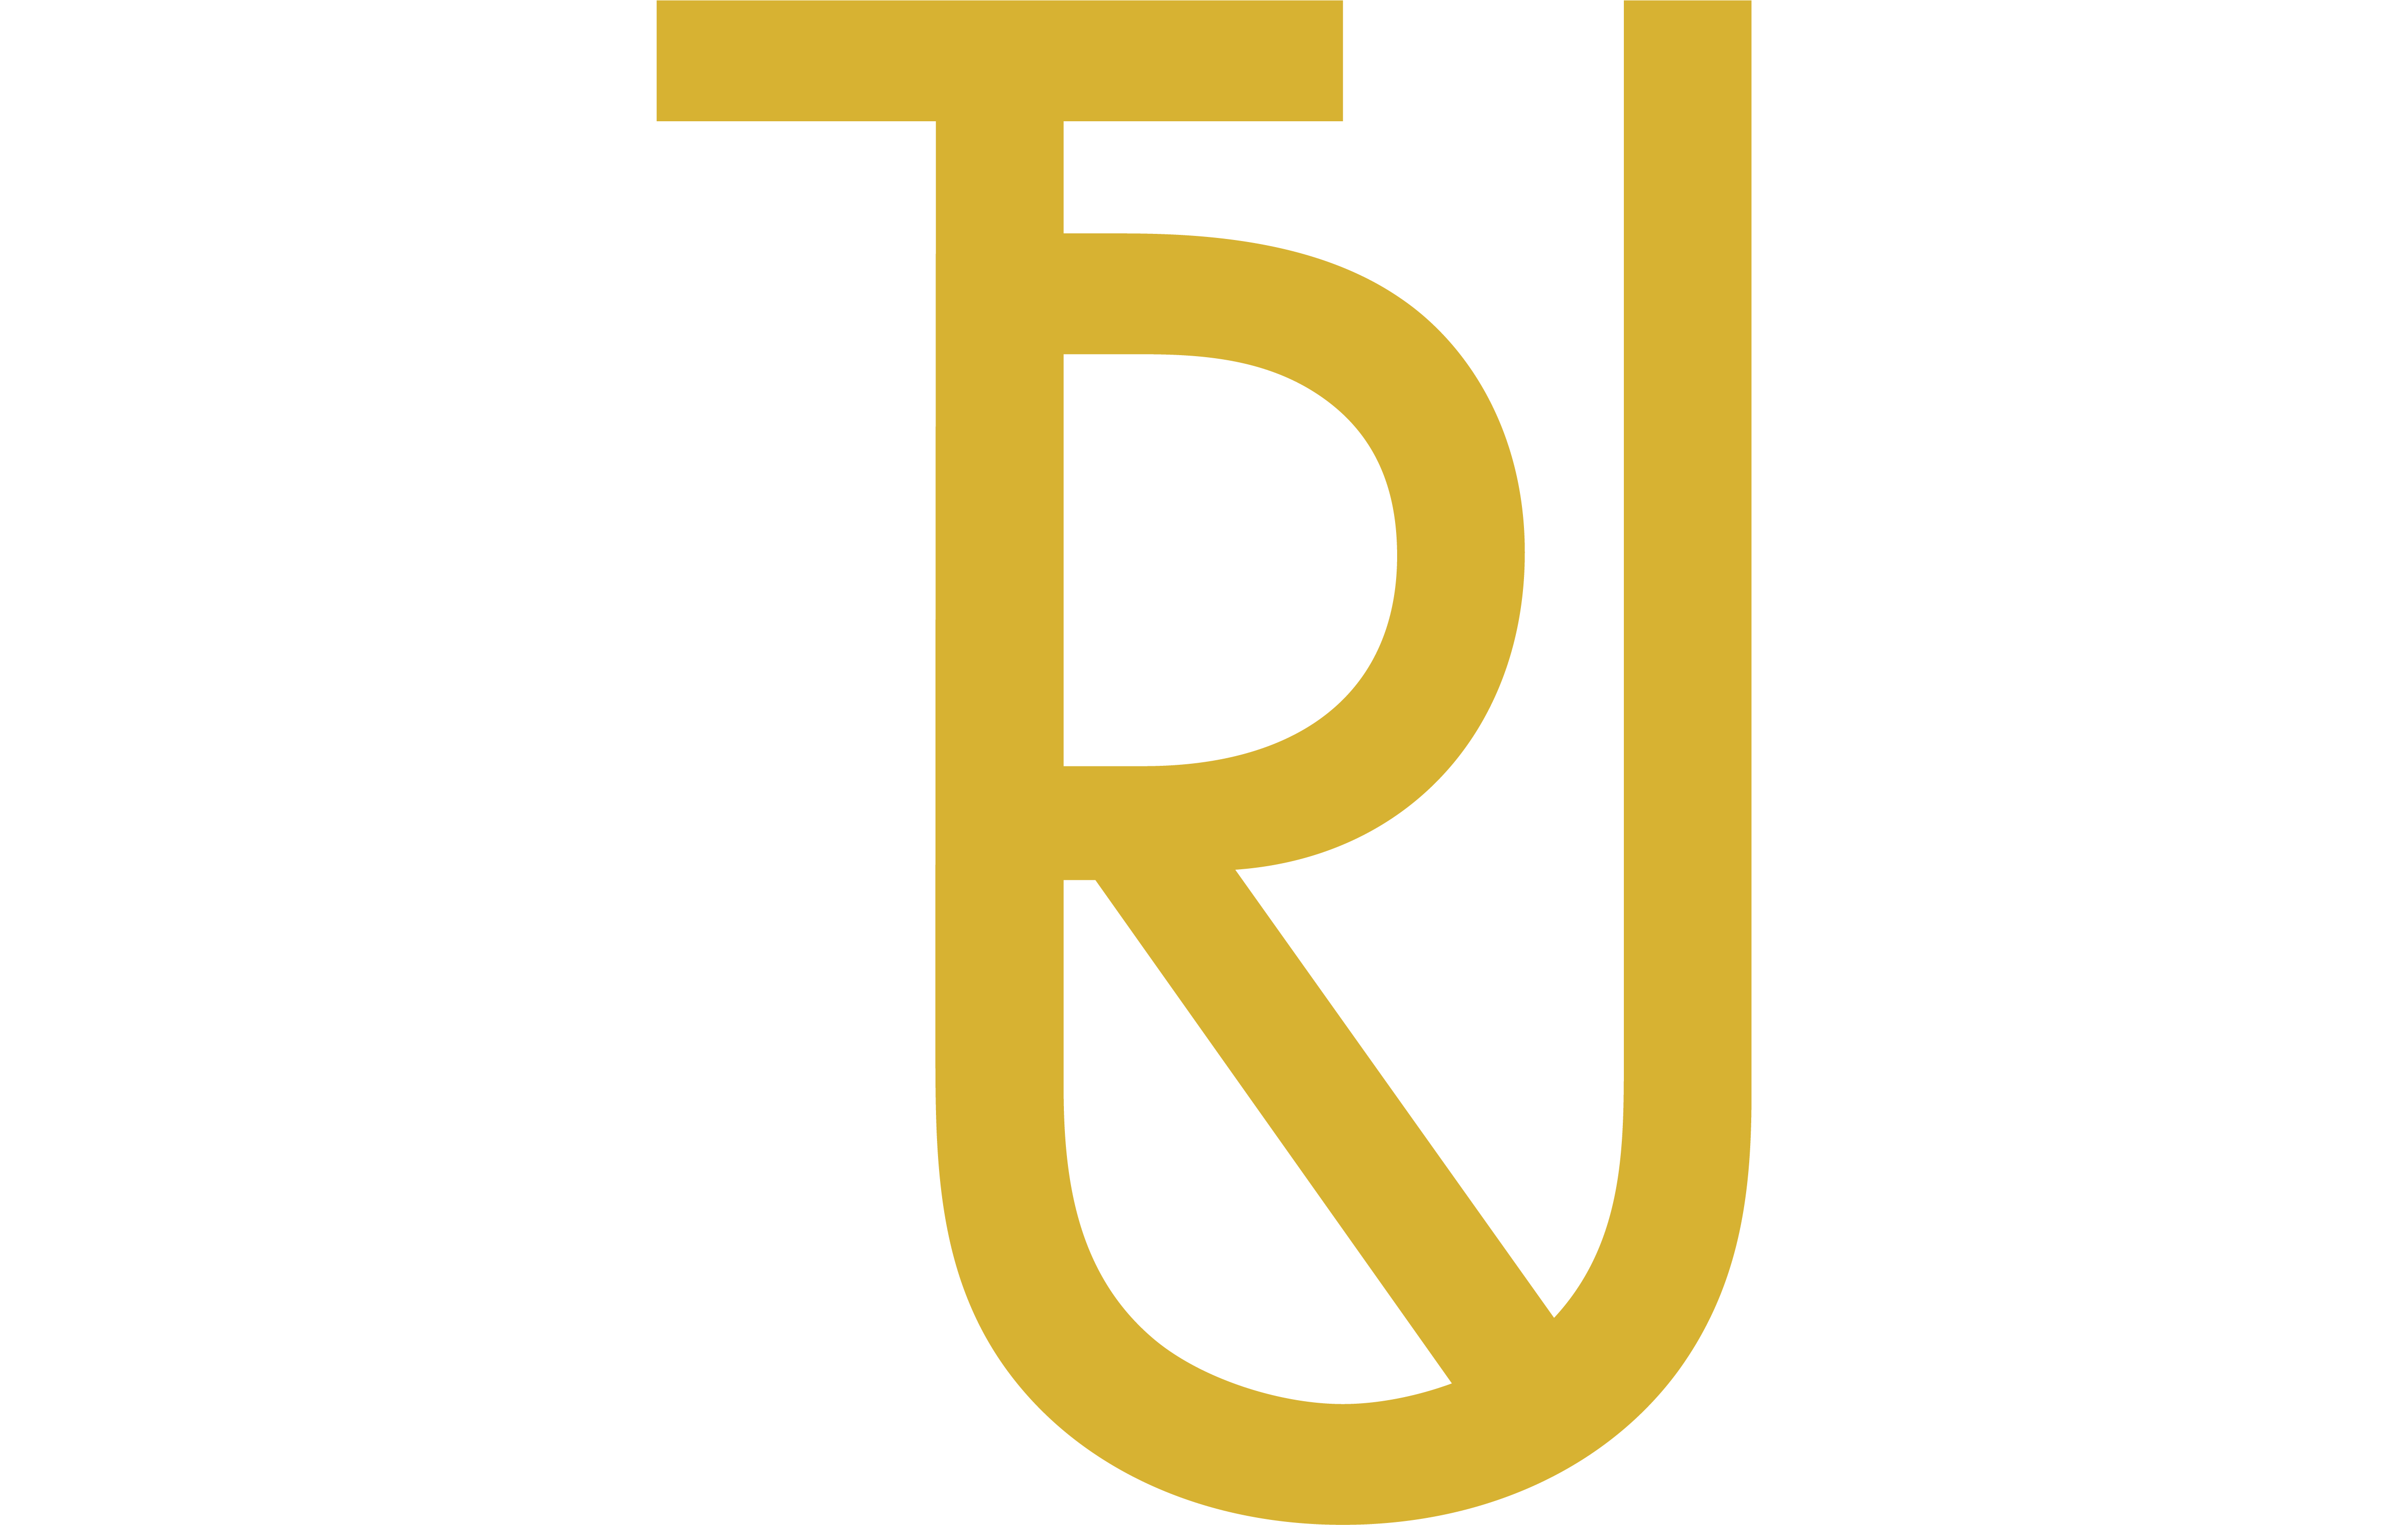 Trucenta logomark